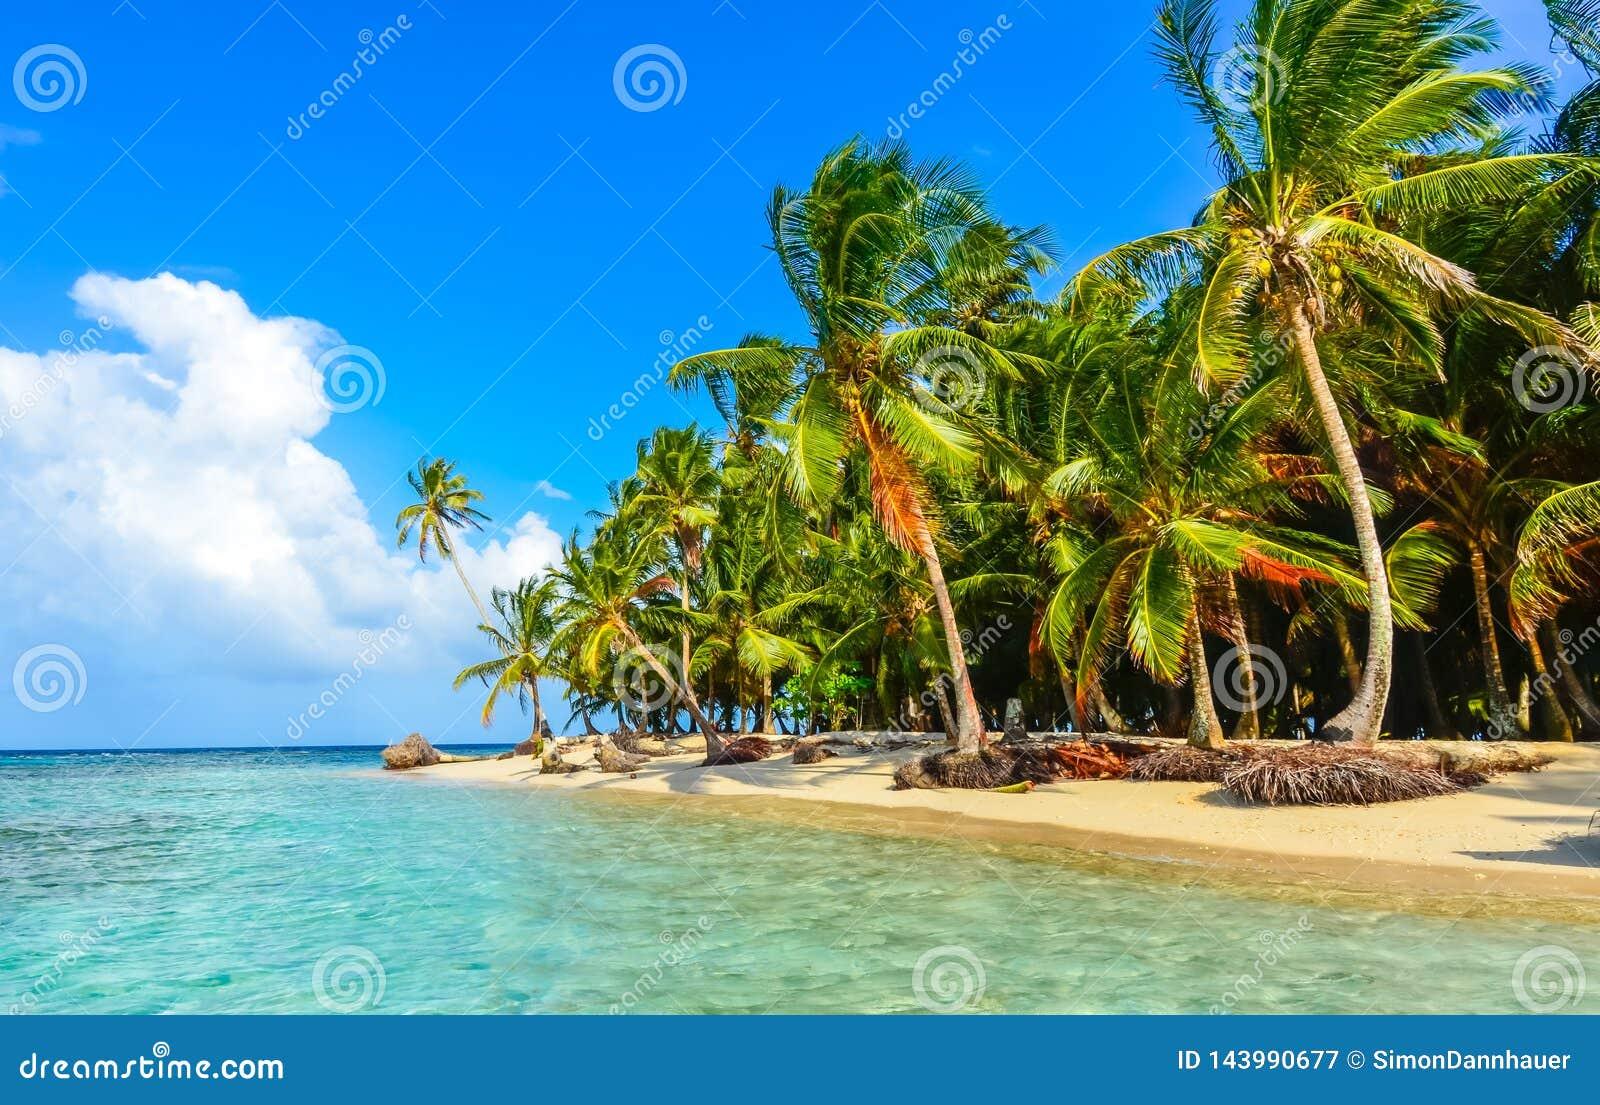 Beautiful Lonely Beach In Caribbean San Blas Island Kuna Yala Panama Turquoise Tropical Sea Paradise Travel Destination Stock Image Image Of Exotic Relaxation 143990677